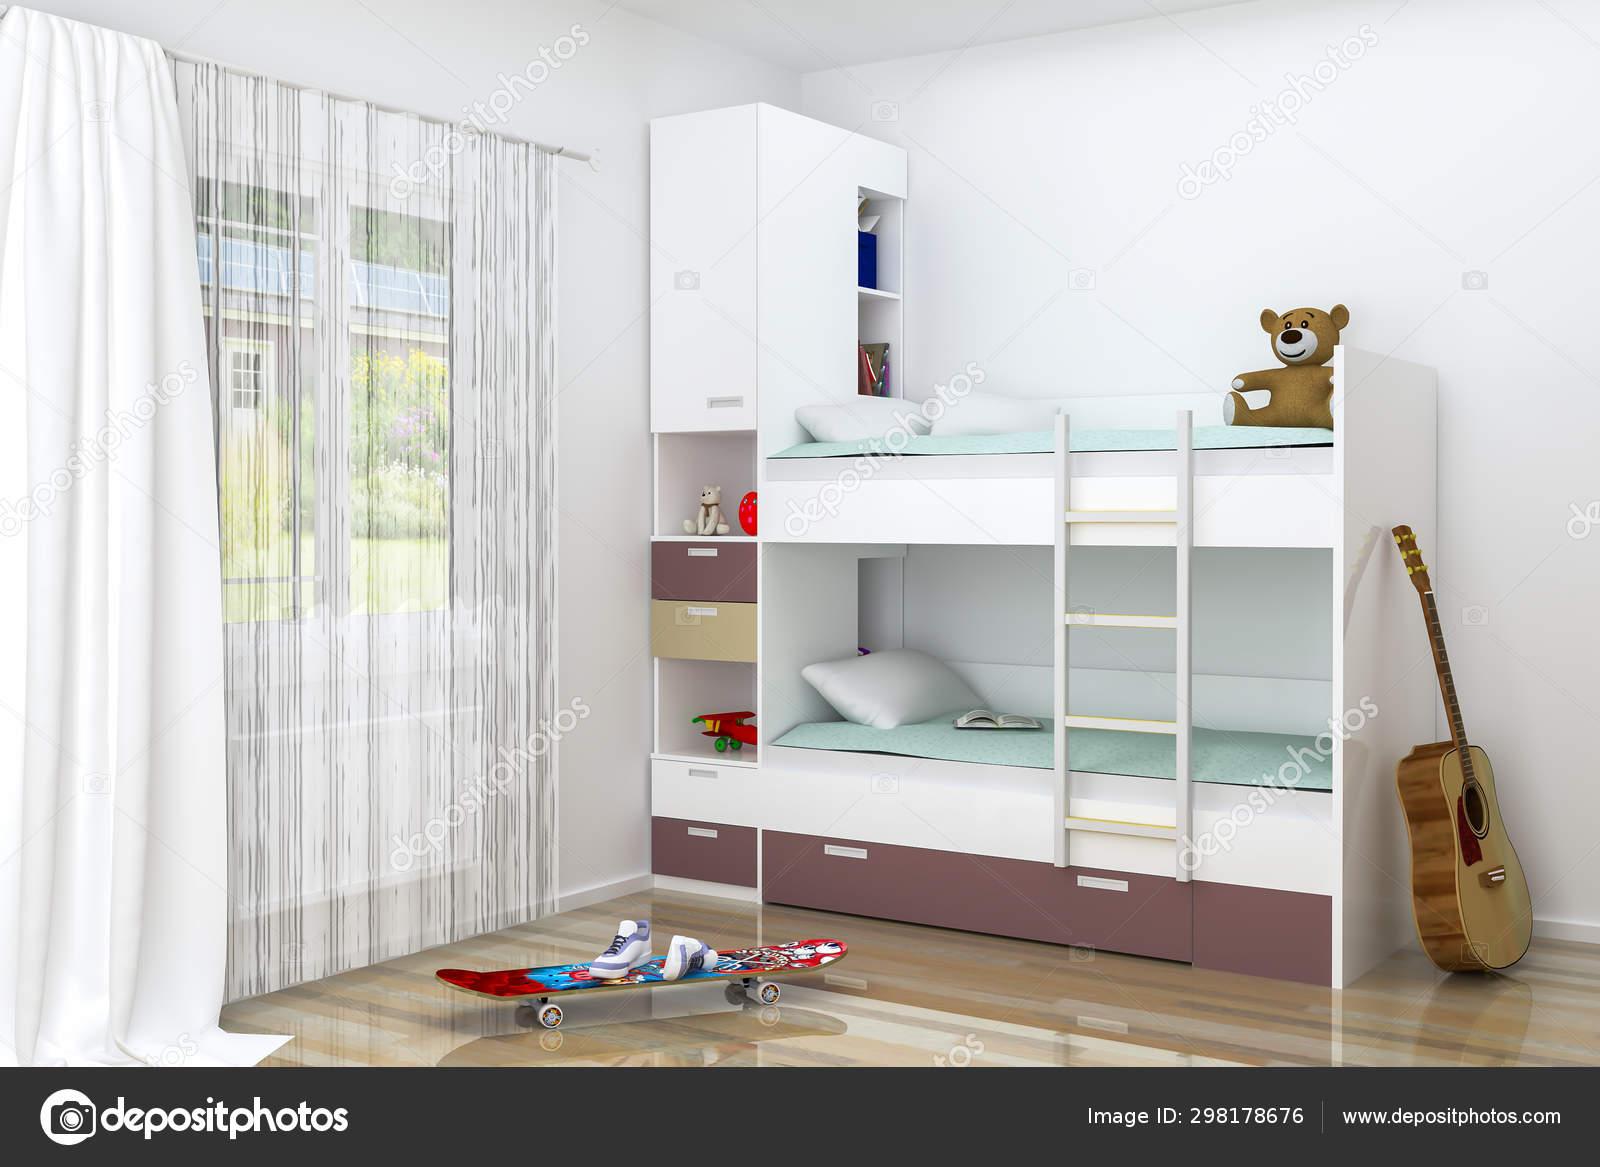 Picture of: Realistic Rendering Modern Kids Bedroom Furniture Design Bunk Bed Decorations Stock Photo C Richard Salamander 298178676